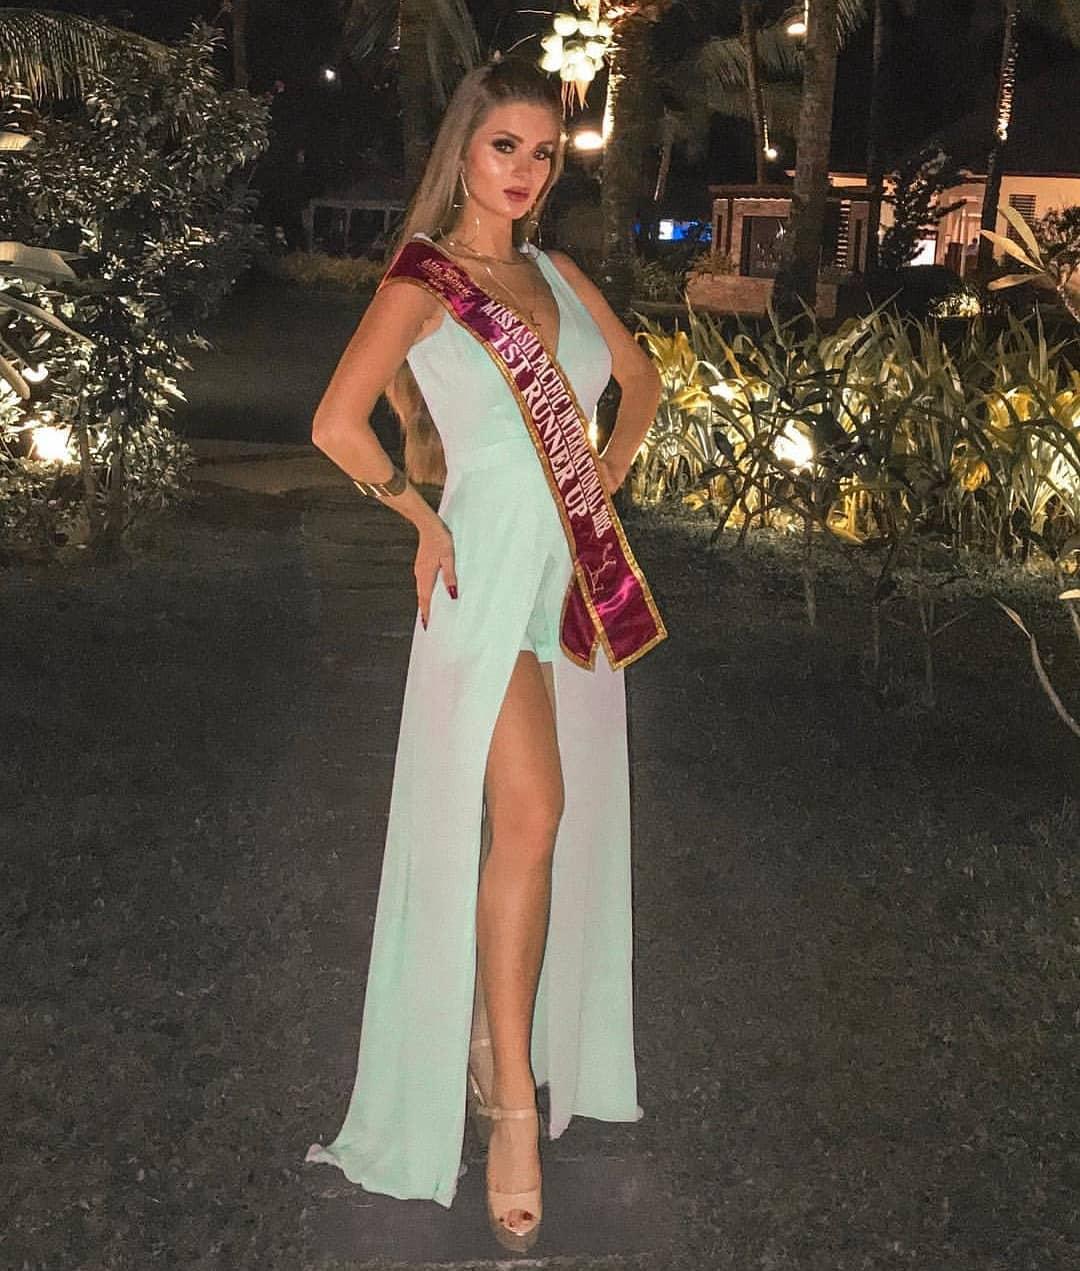 gabriela palma, miss brasil empresarial 2018. - Página 21 42739810